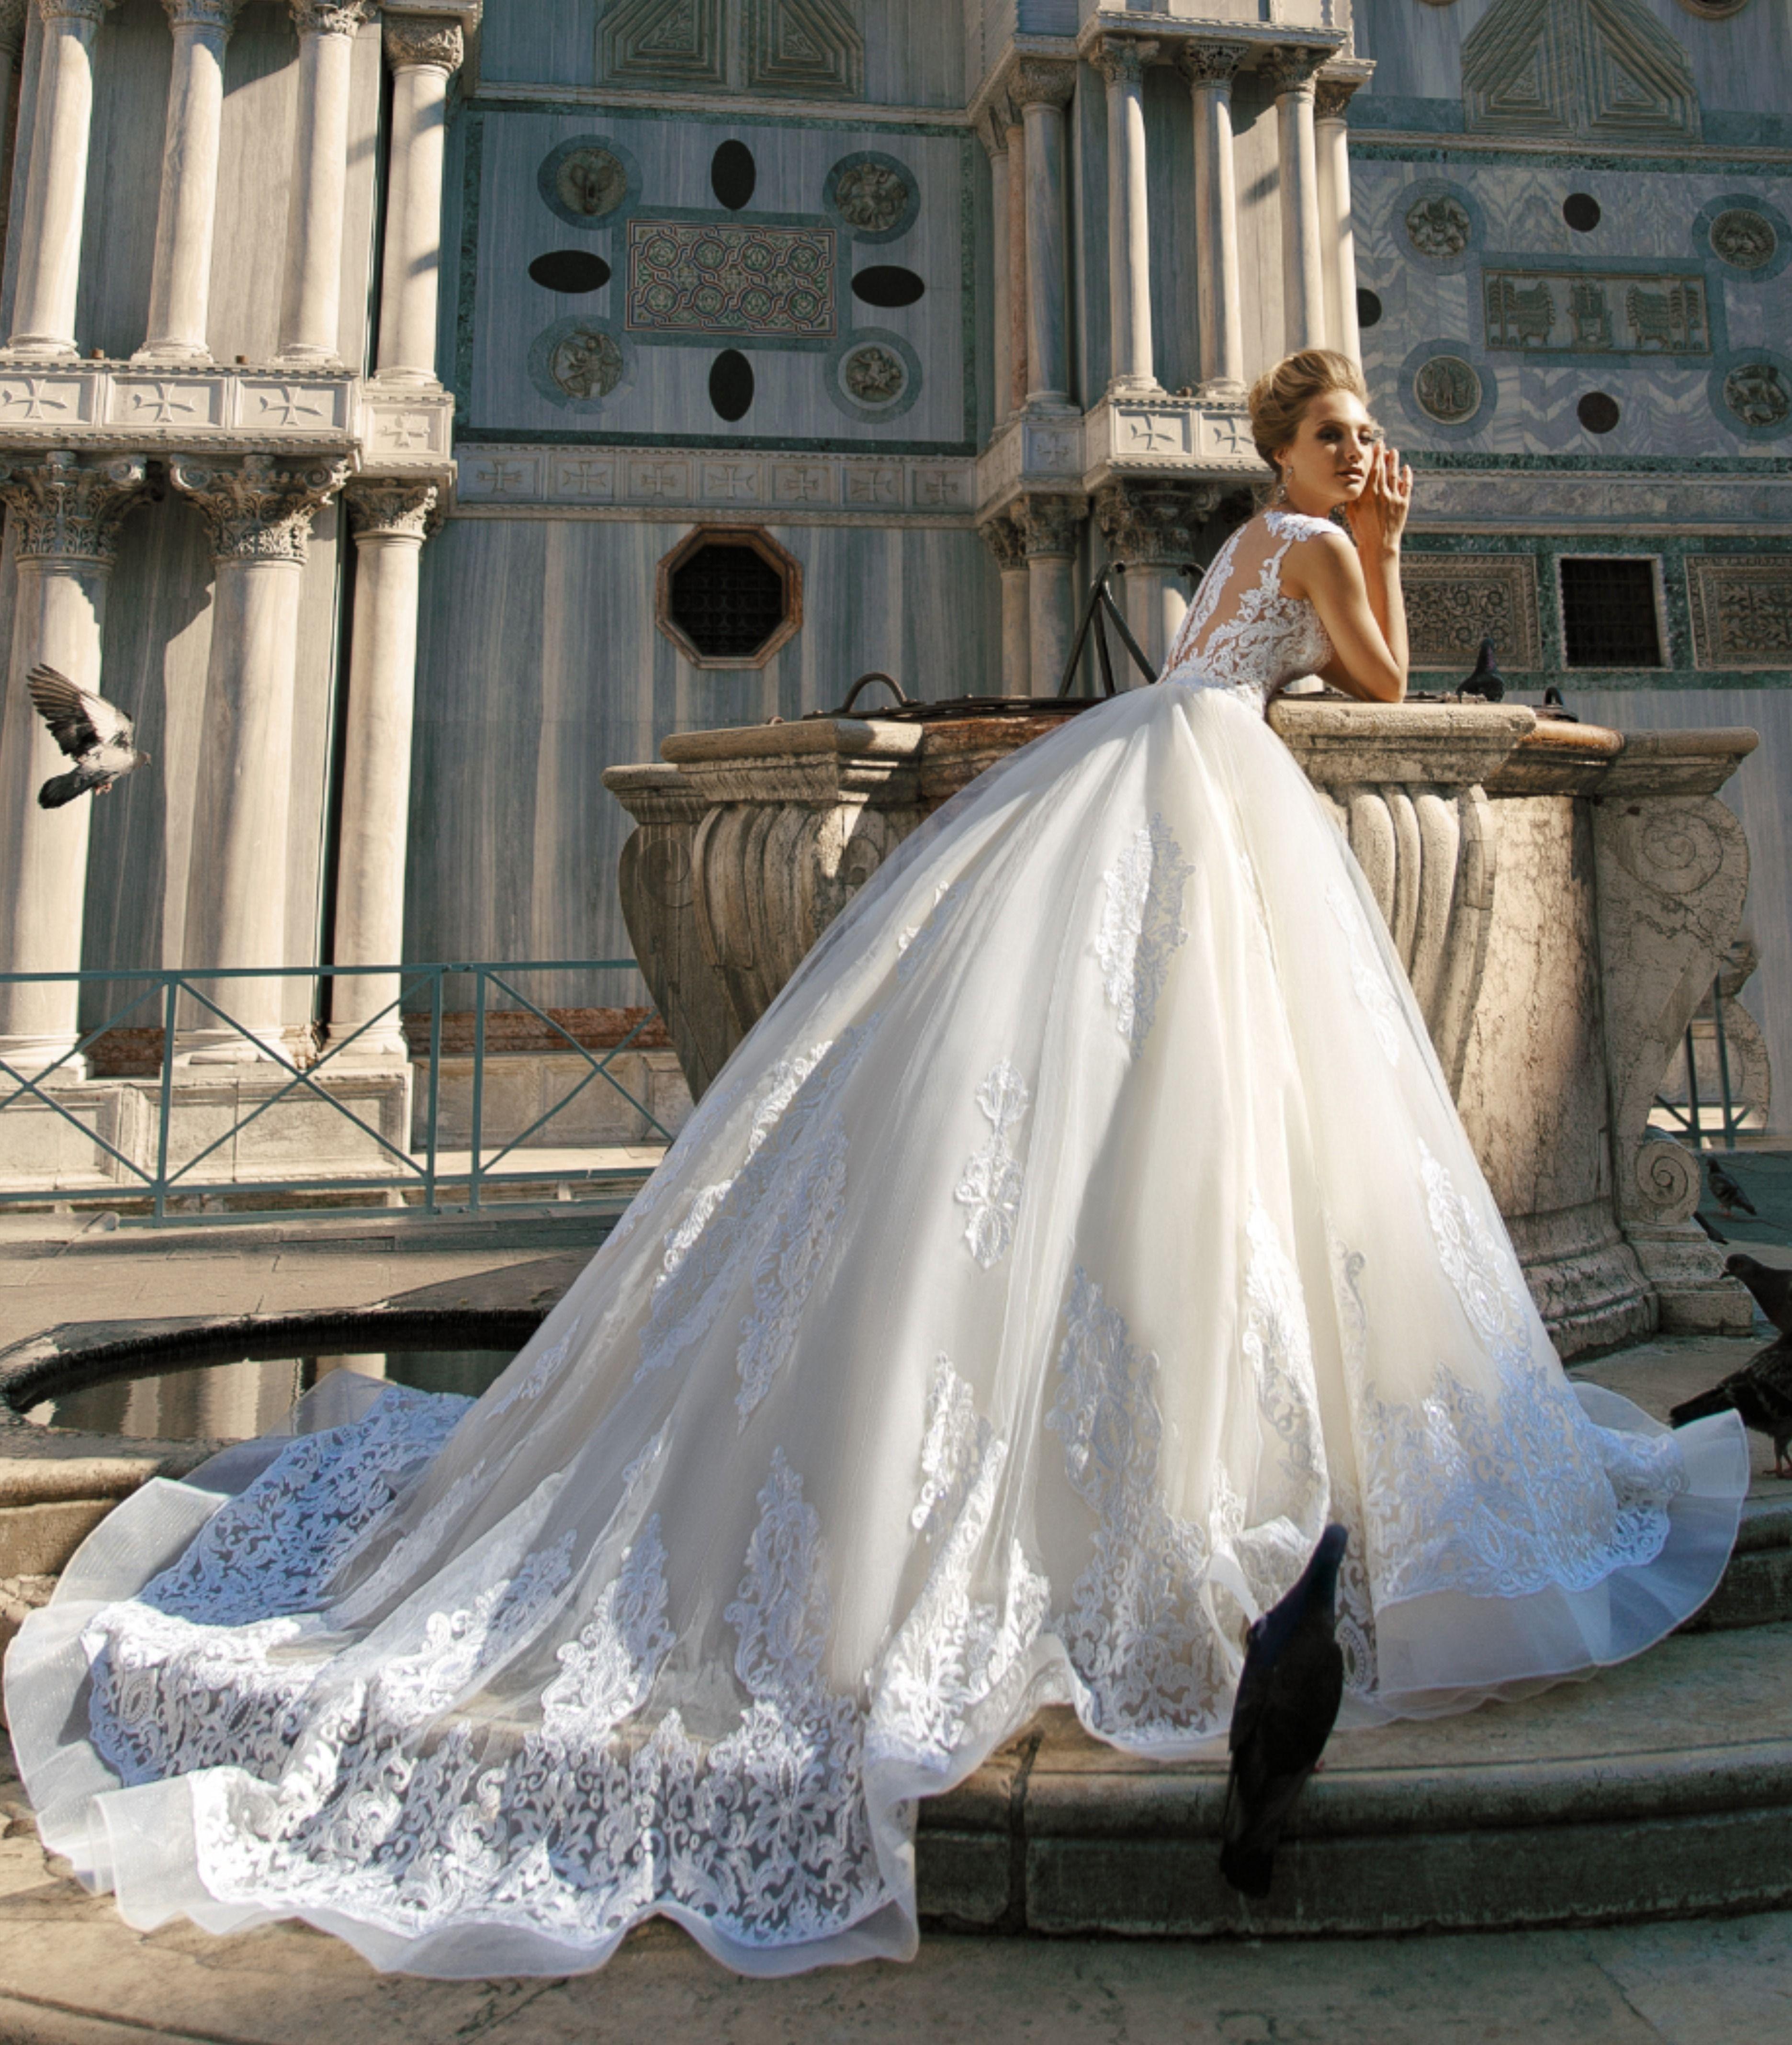 Callypso Ii Wedding Dress Italian Romance Collection Italian Wedding Dresses Wedding Dresses Lace Princess Wedding Dresses